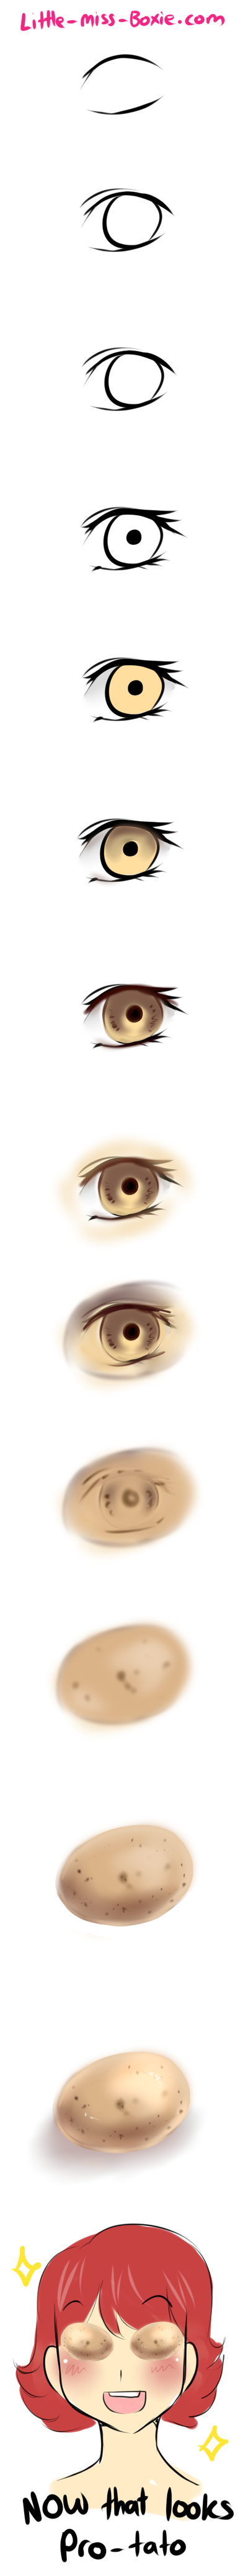 Eye Tutorial by Little-Miss-Boxie